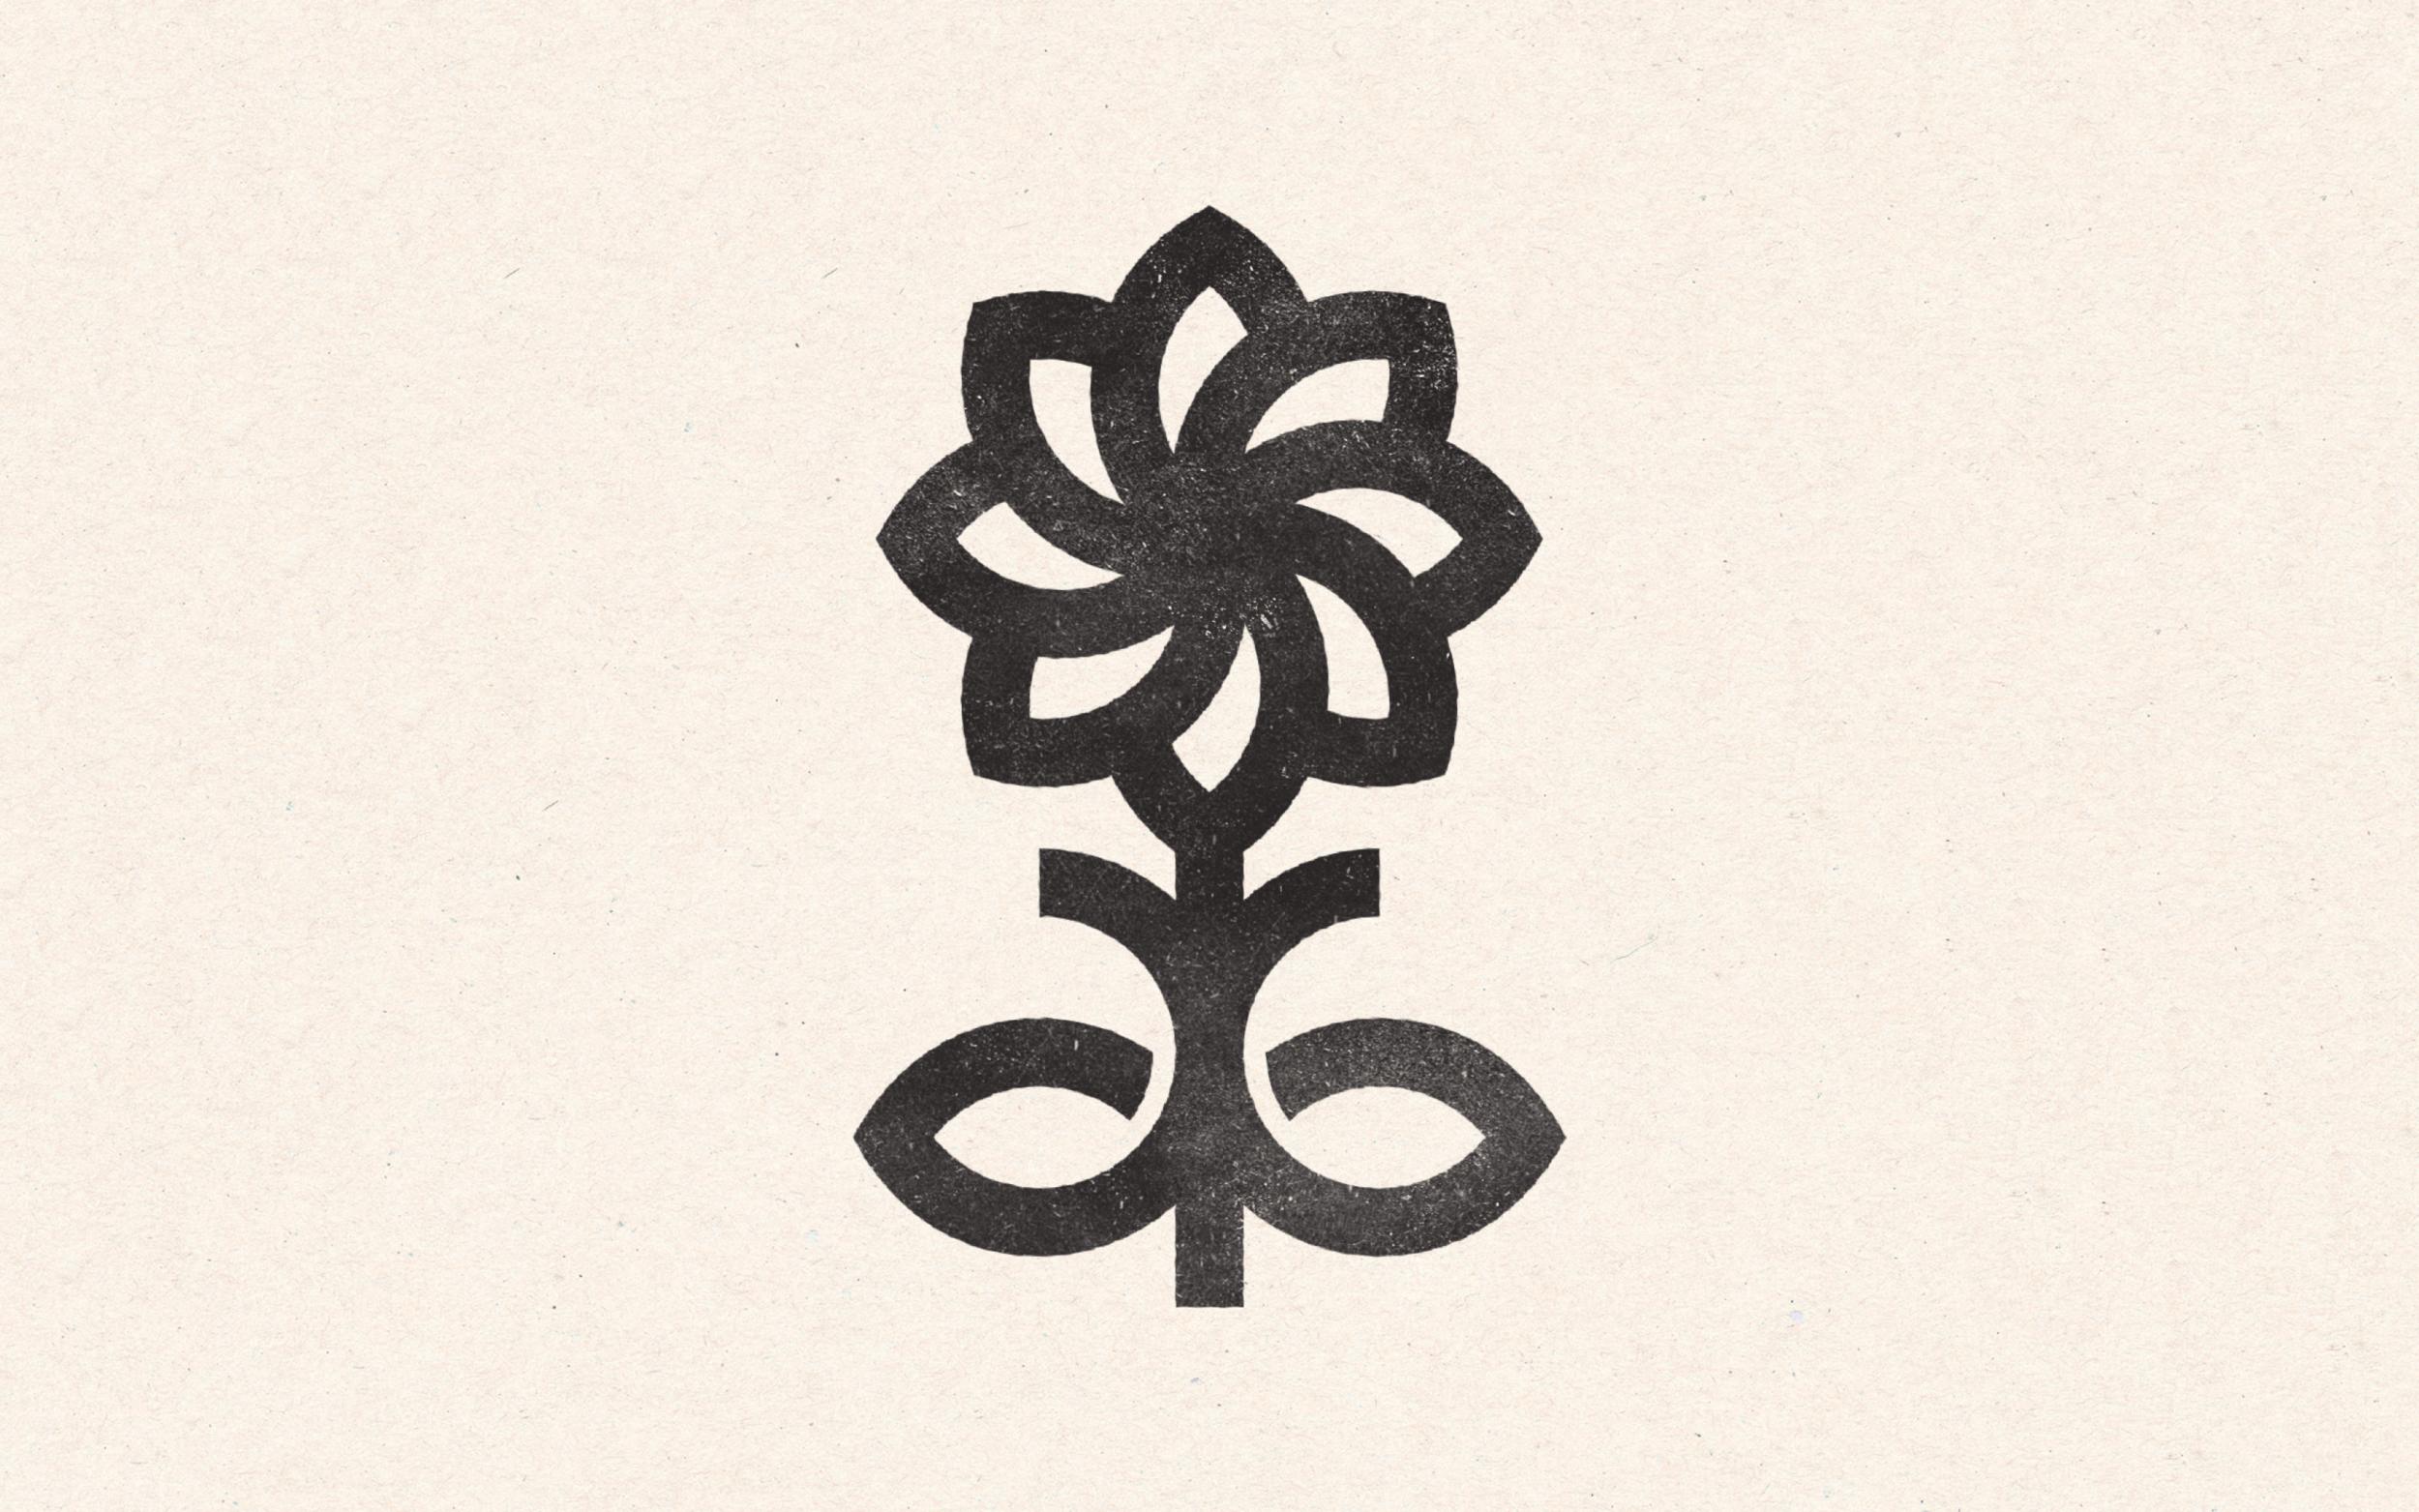 flowerpower_001.png